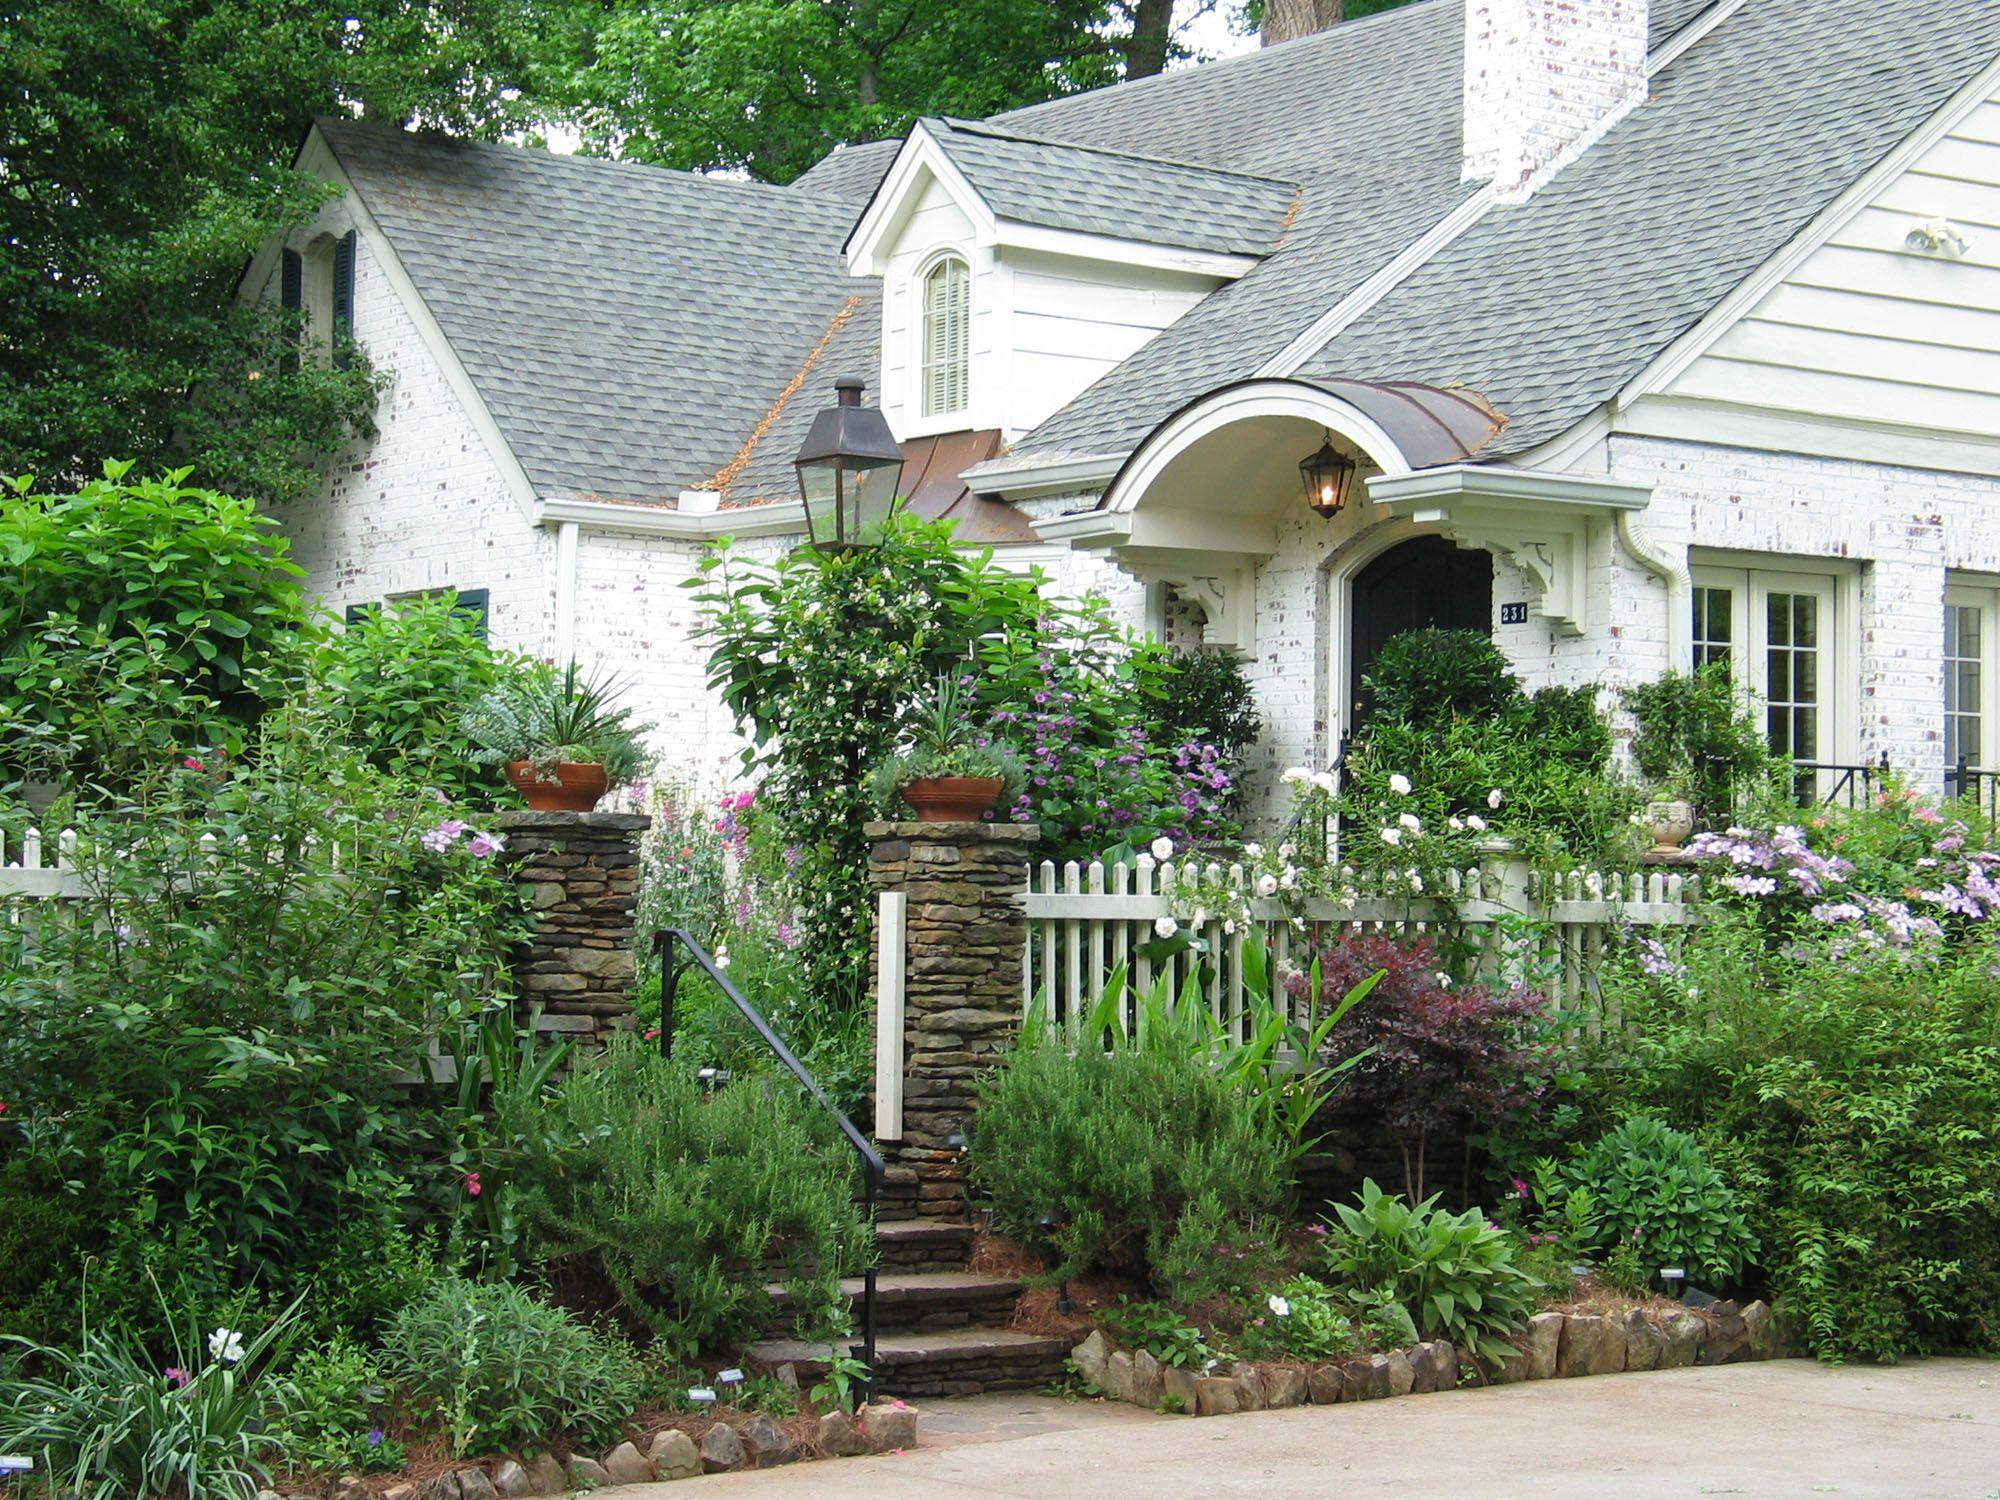 Huntington Road Residence - Harrison Design - undefined - Discover more at harrisondesign.com